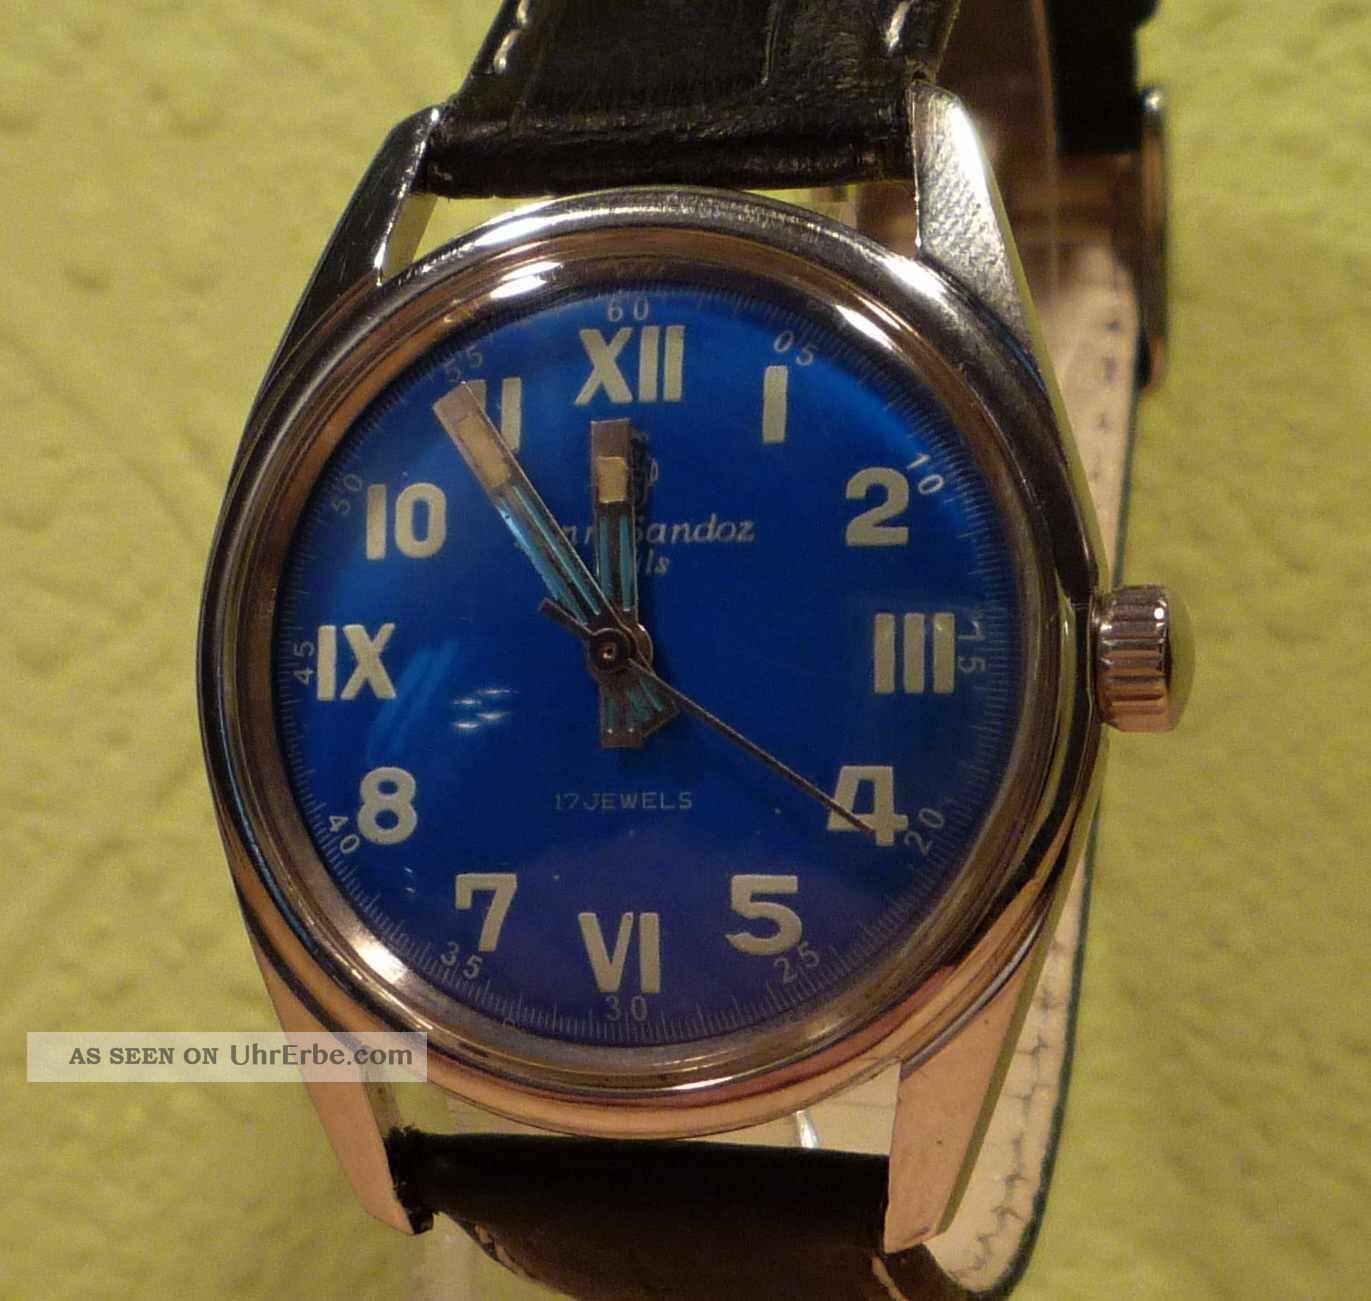 Sammlerzustand Henri Sandoz & Fils,  Military - Style,  Ca.  1965,  Sehr Selten Armbanduhren Bild